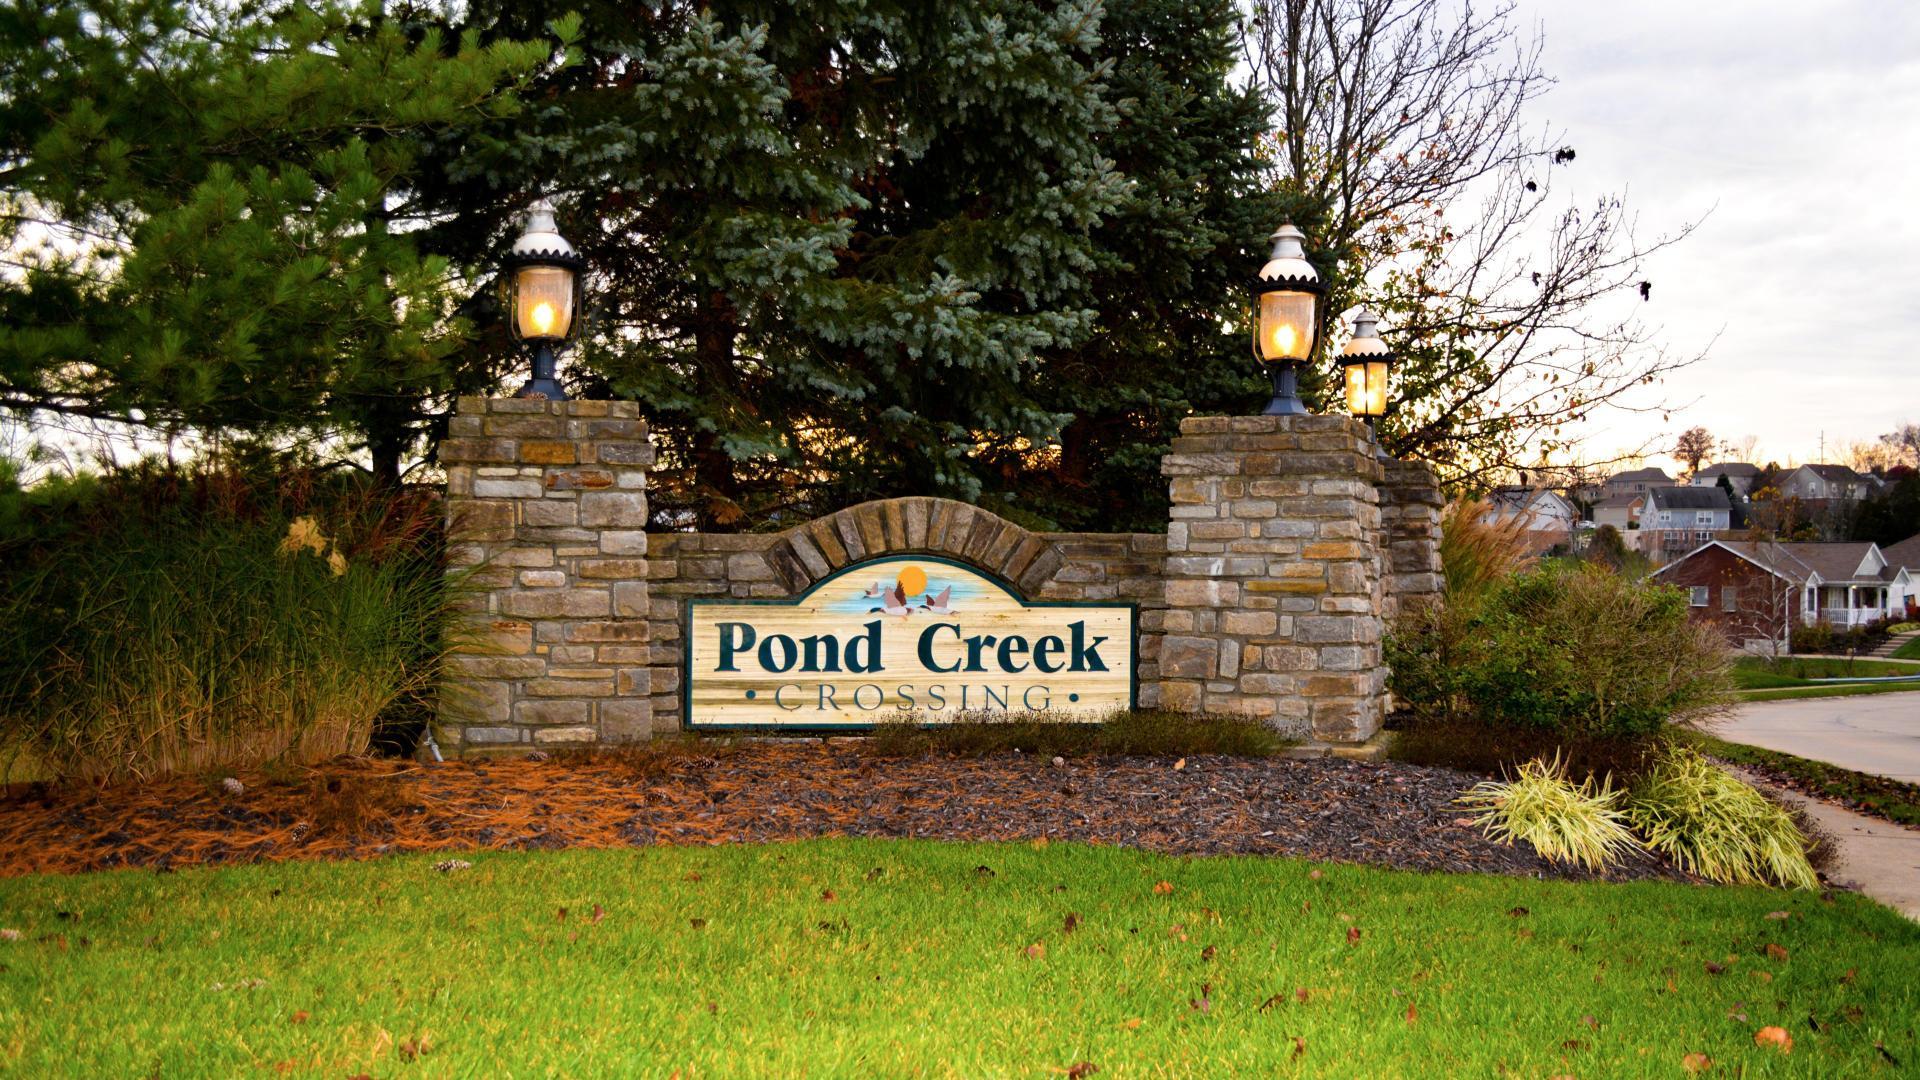 'Pond Creek Crossing' by Maronda - Cincinnati & Kentucky in Cincinnati